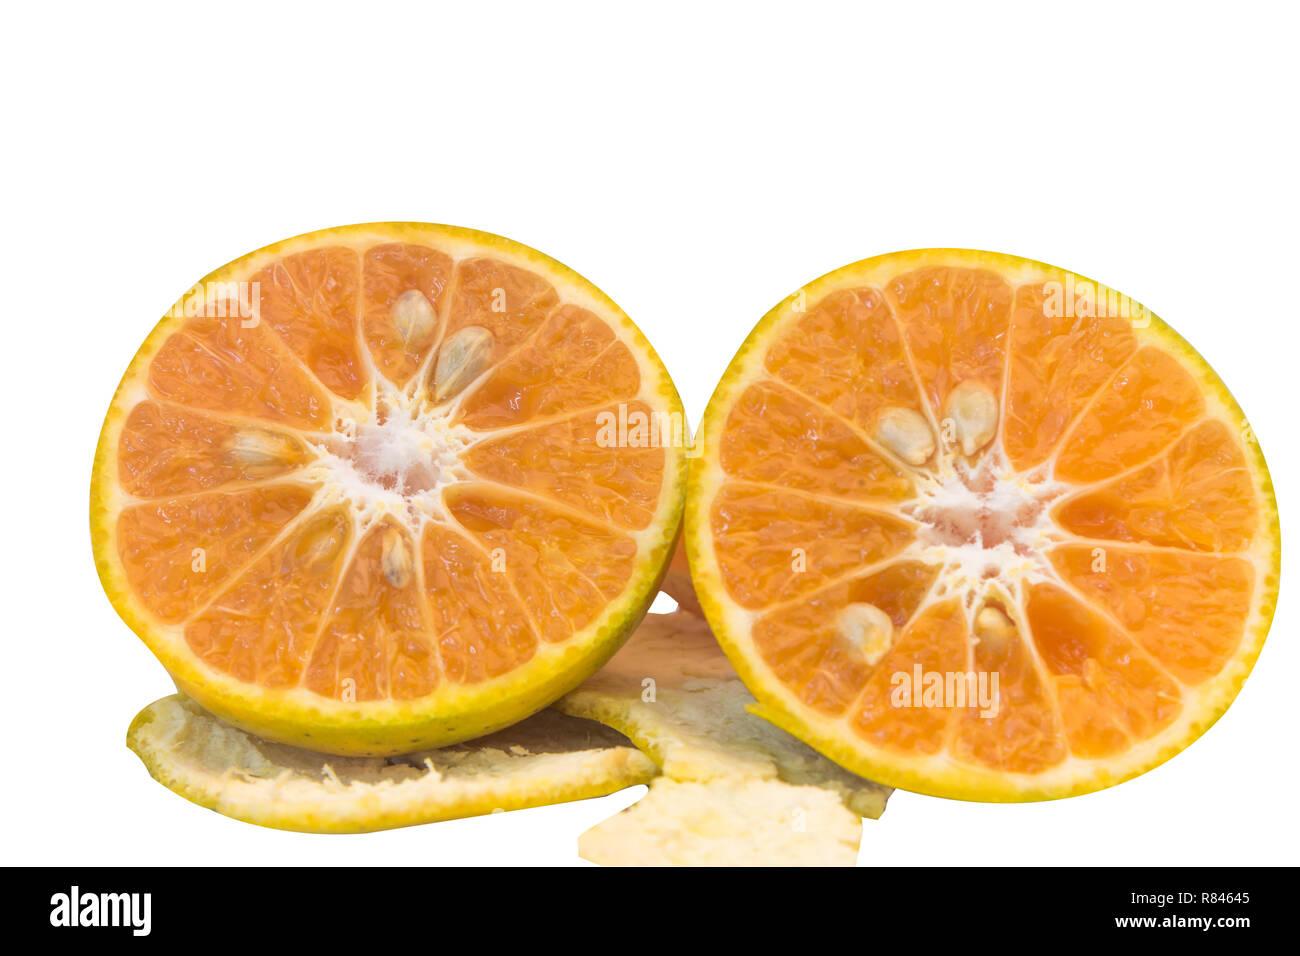 half of fresh orange and slice orange peel oranges with white background isolated with clipping path - Stock Image